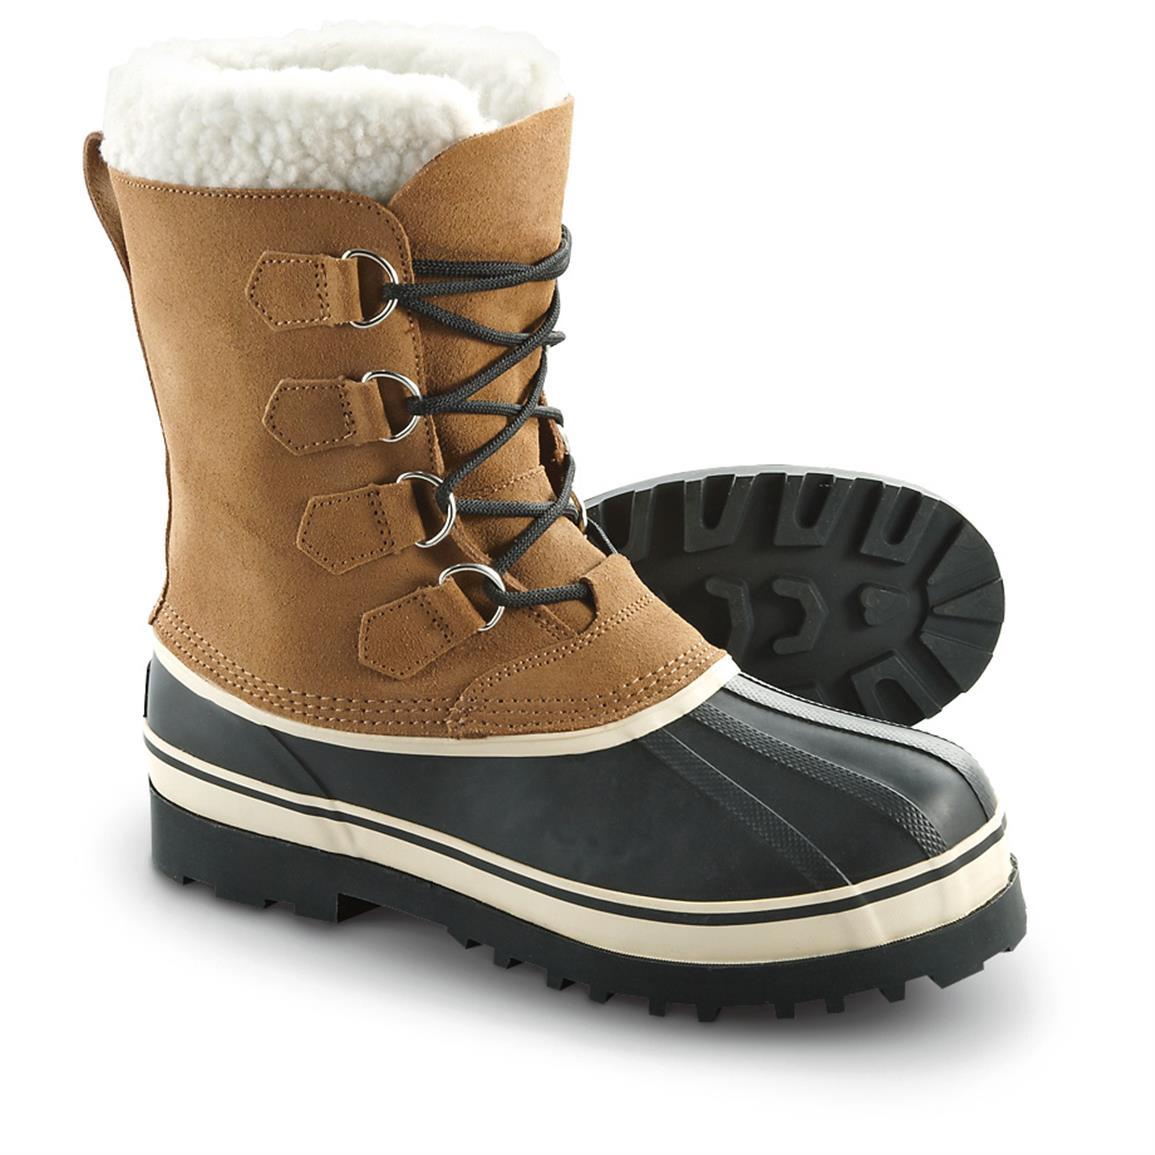 mens winter boots guide gear menu0027s hovland wool lined winter boots JDJLPMA